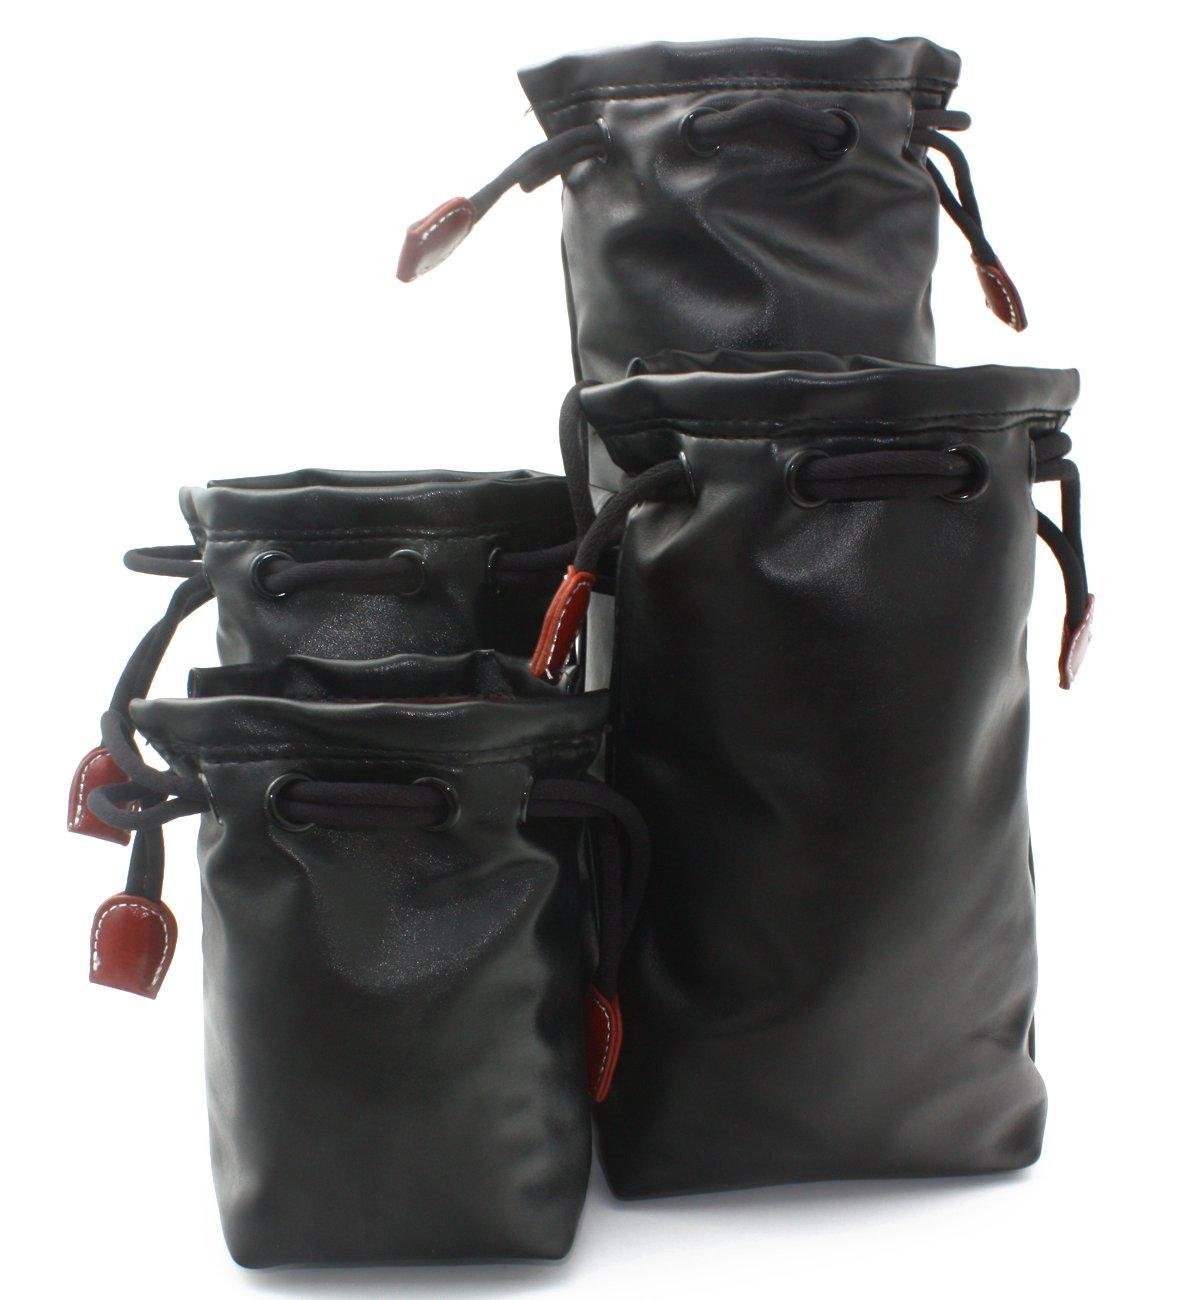 CEARI Medium Leather Lens Pouch Bag for Canon Nikon Pentax Sony Fujifilm Sigma DSLR Camera Lens